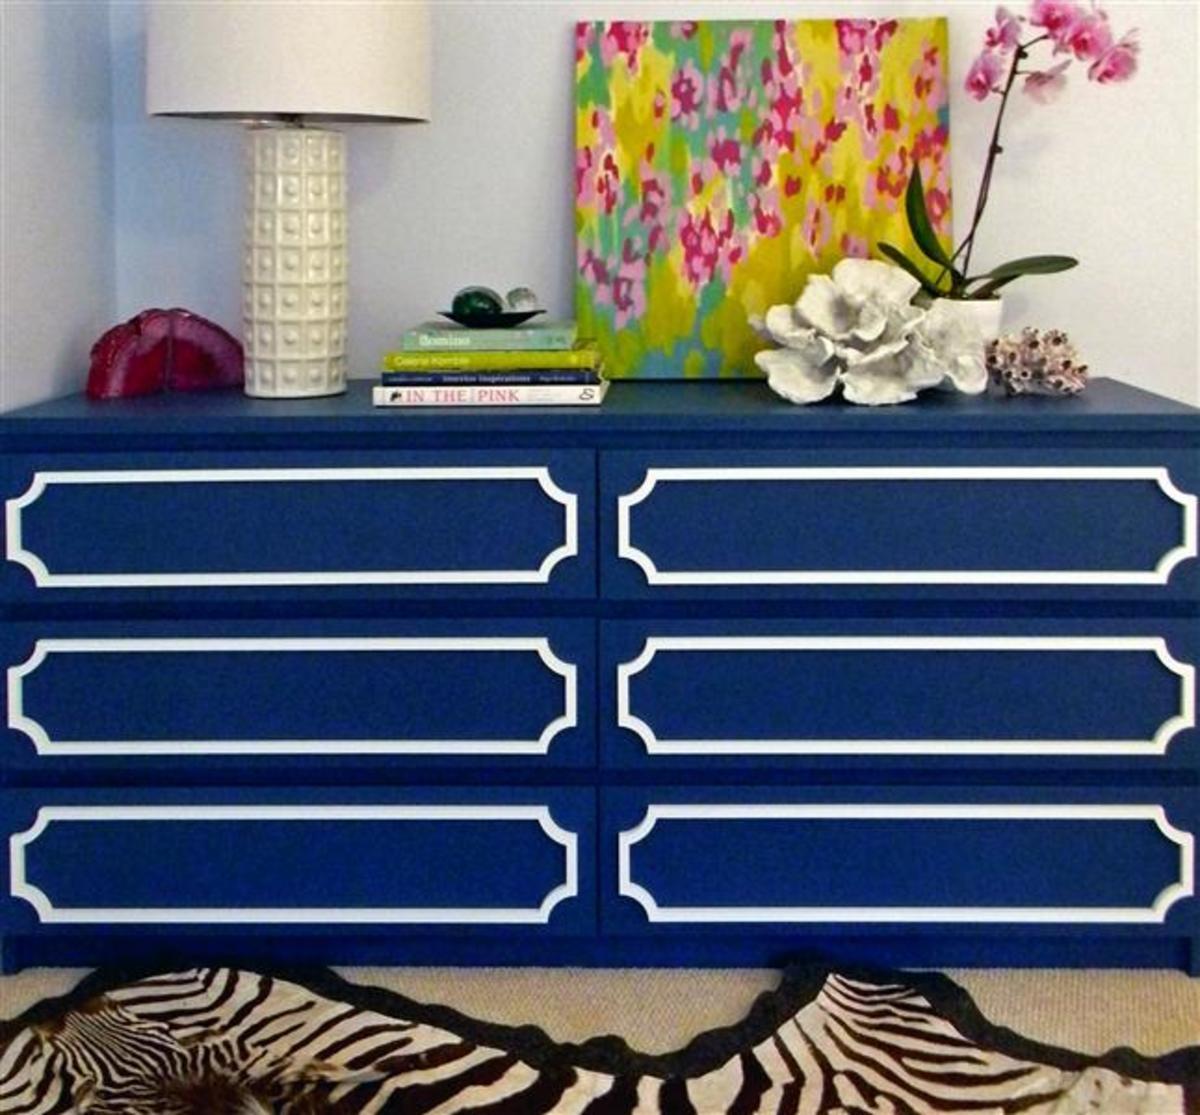 5 Ways to Customize Ikea Furniture